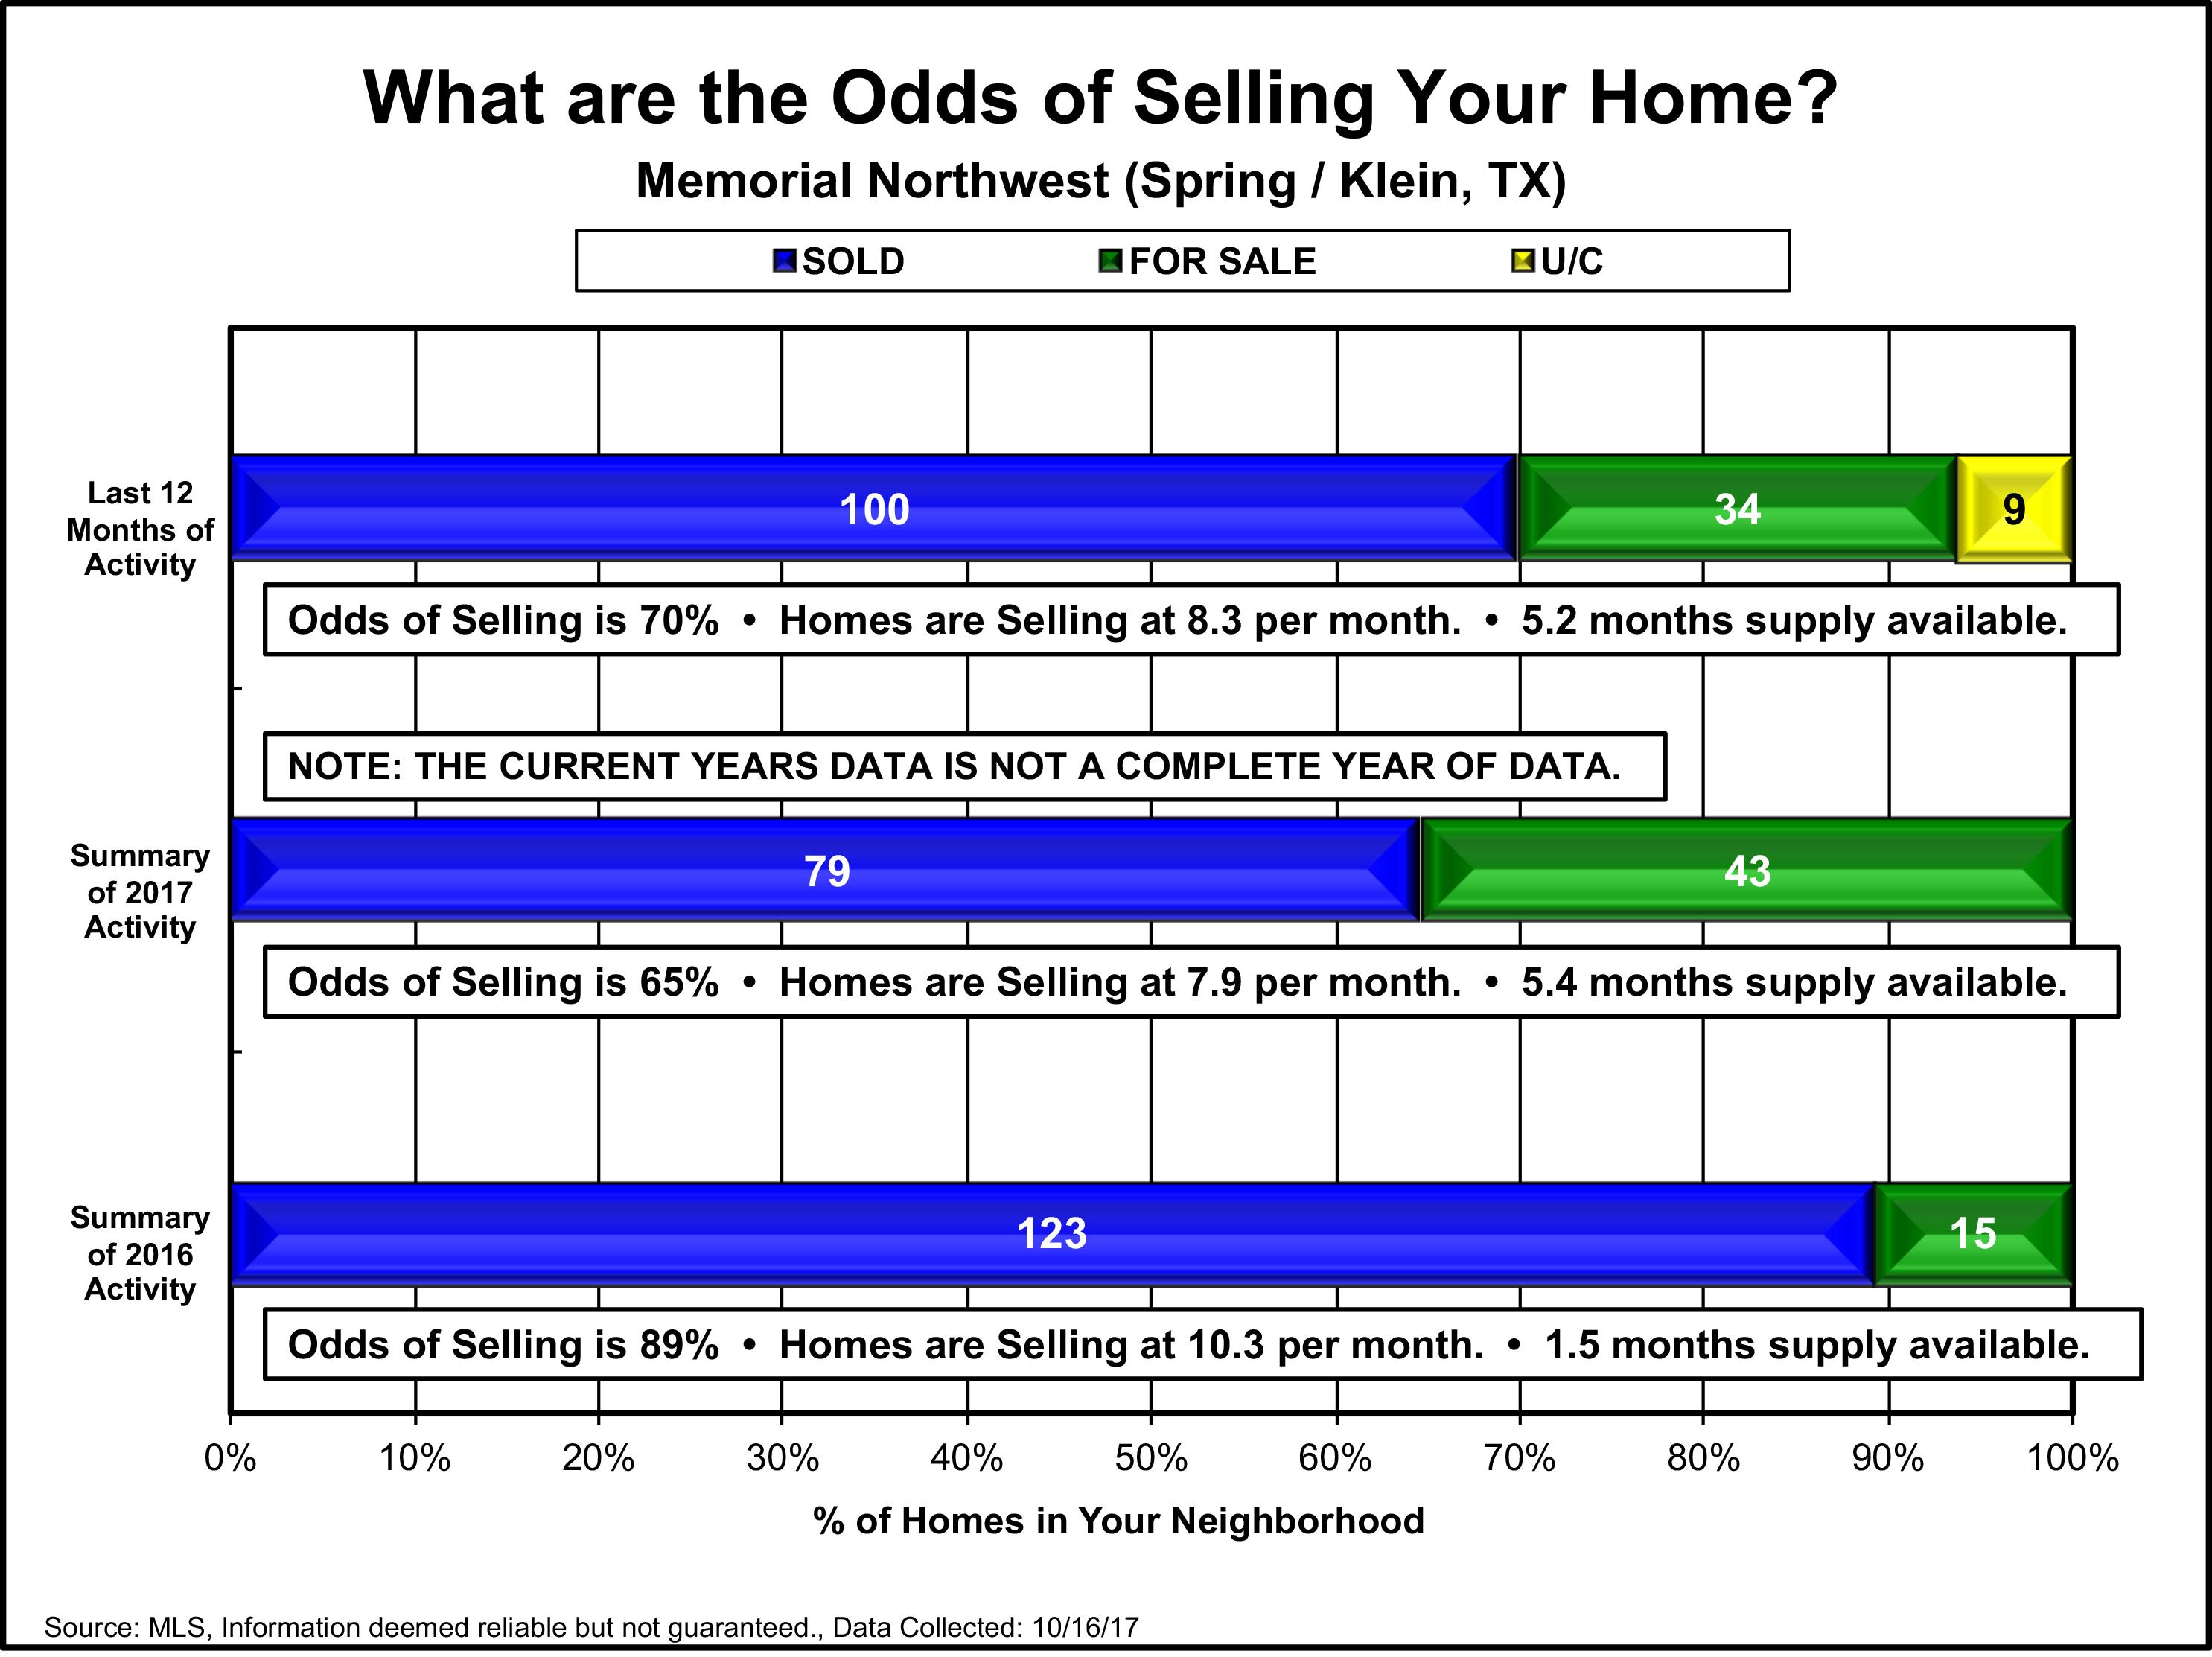 Memorial Northwest October 9th 2017 Market Update Jordan Schilleci Realtor Real Estate Agent Klein Spring 77379